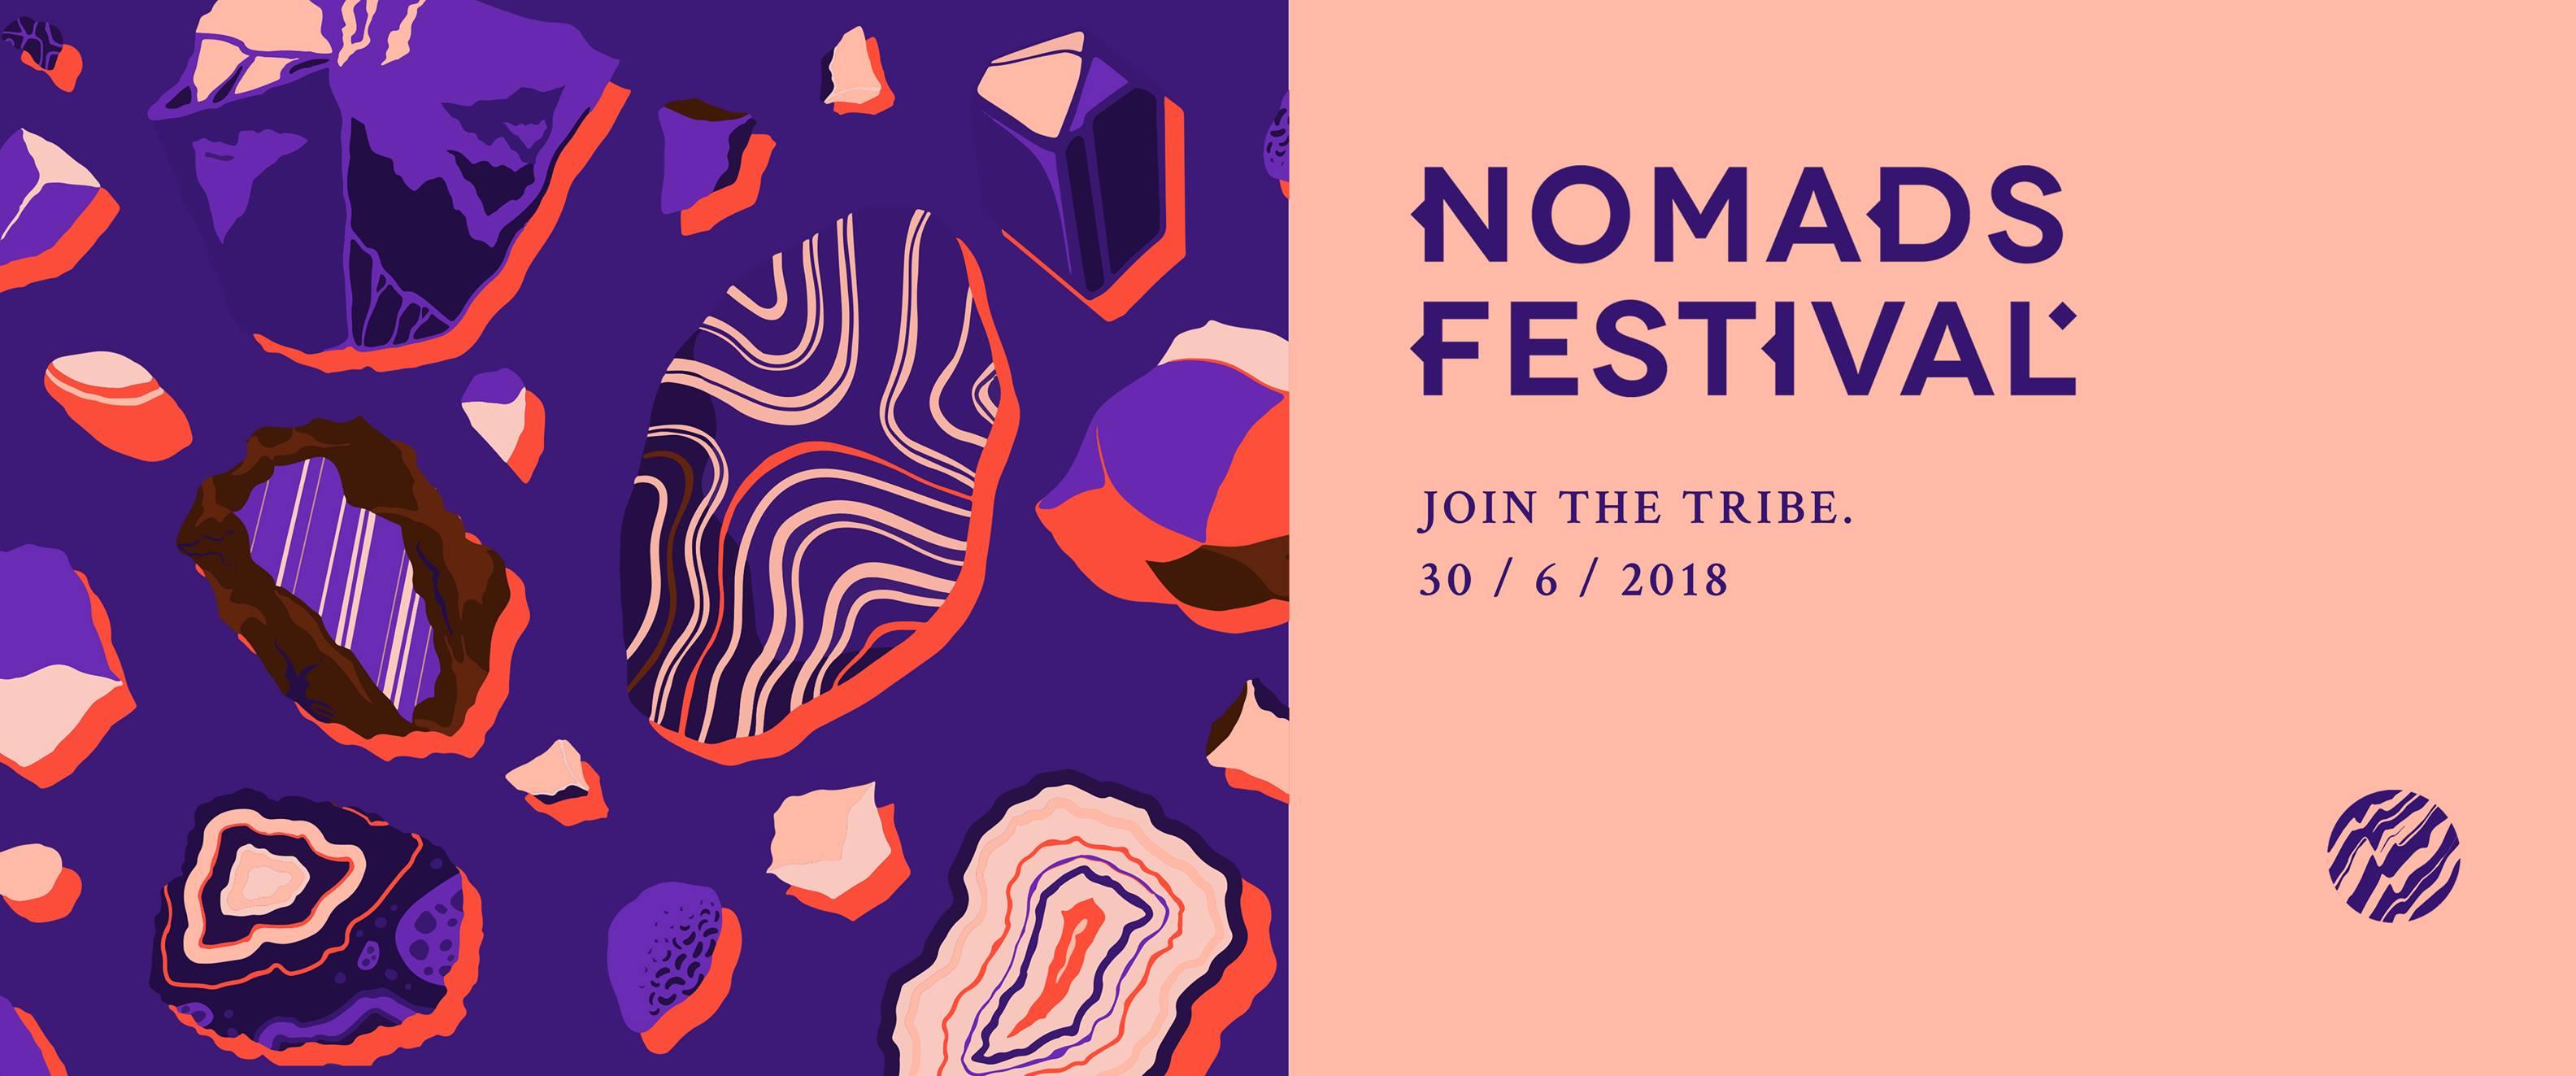 Nomads Festival 2018